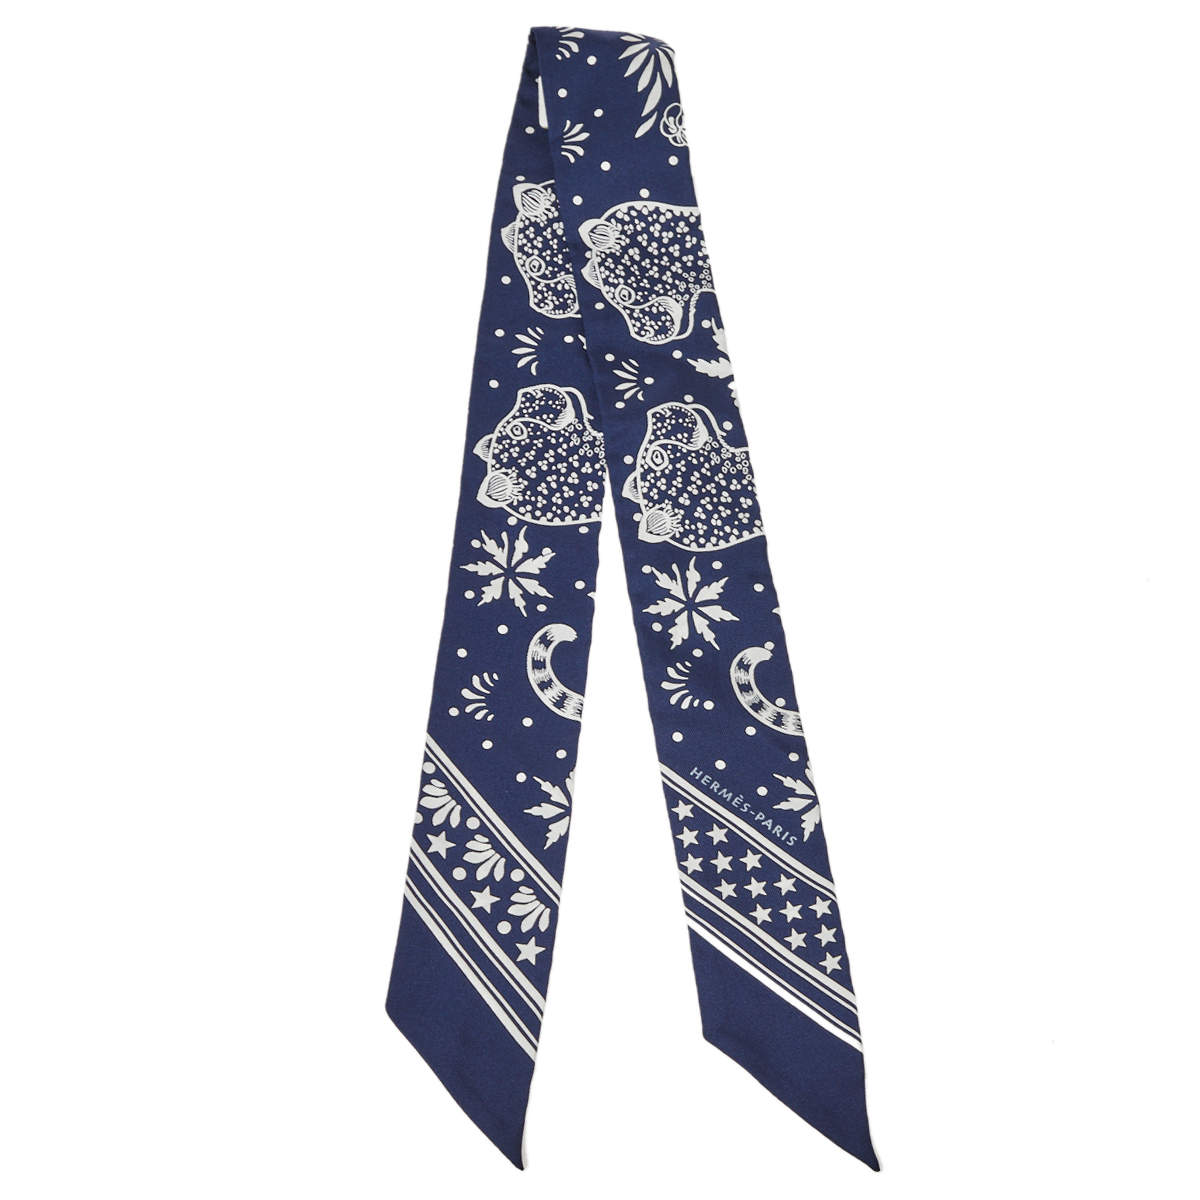 Hermes Navy Blue Les Leopards Silk Bandana Twilly